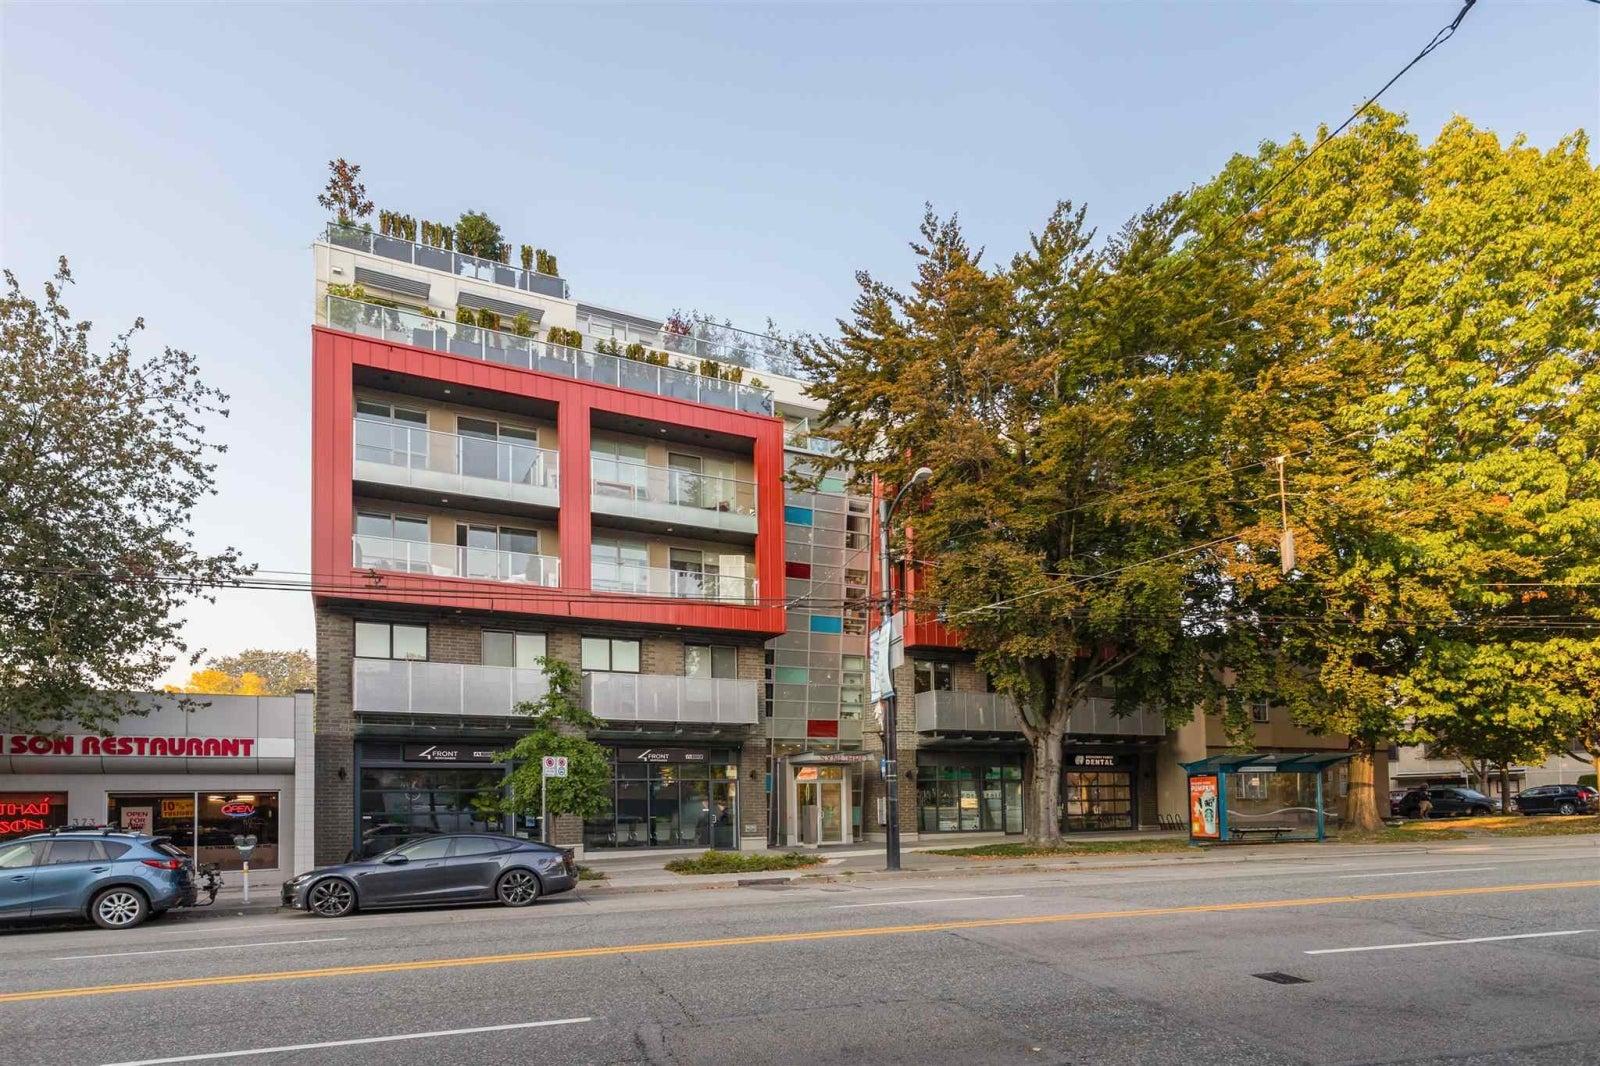 408 379 E BROADWAY AVENUE - Mount Pleasant VE Apartment/Condo for sale, 2 Bedrooms (R2599900) #31